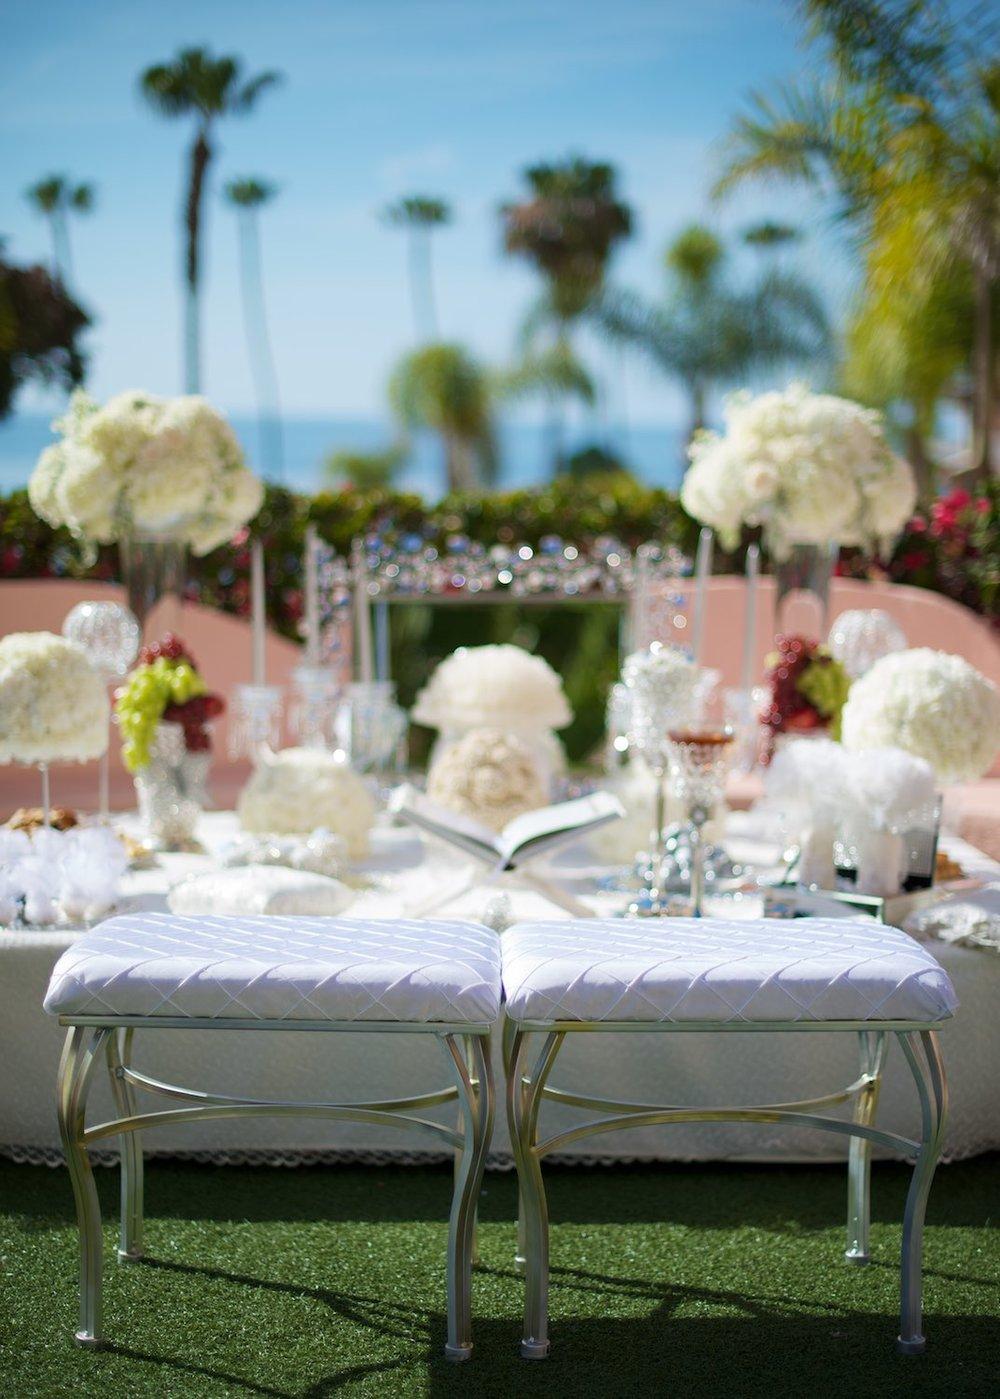 la-valencia-wedding-michal-pfeil-26.jpg